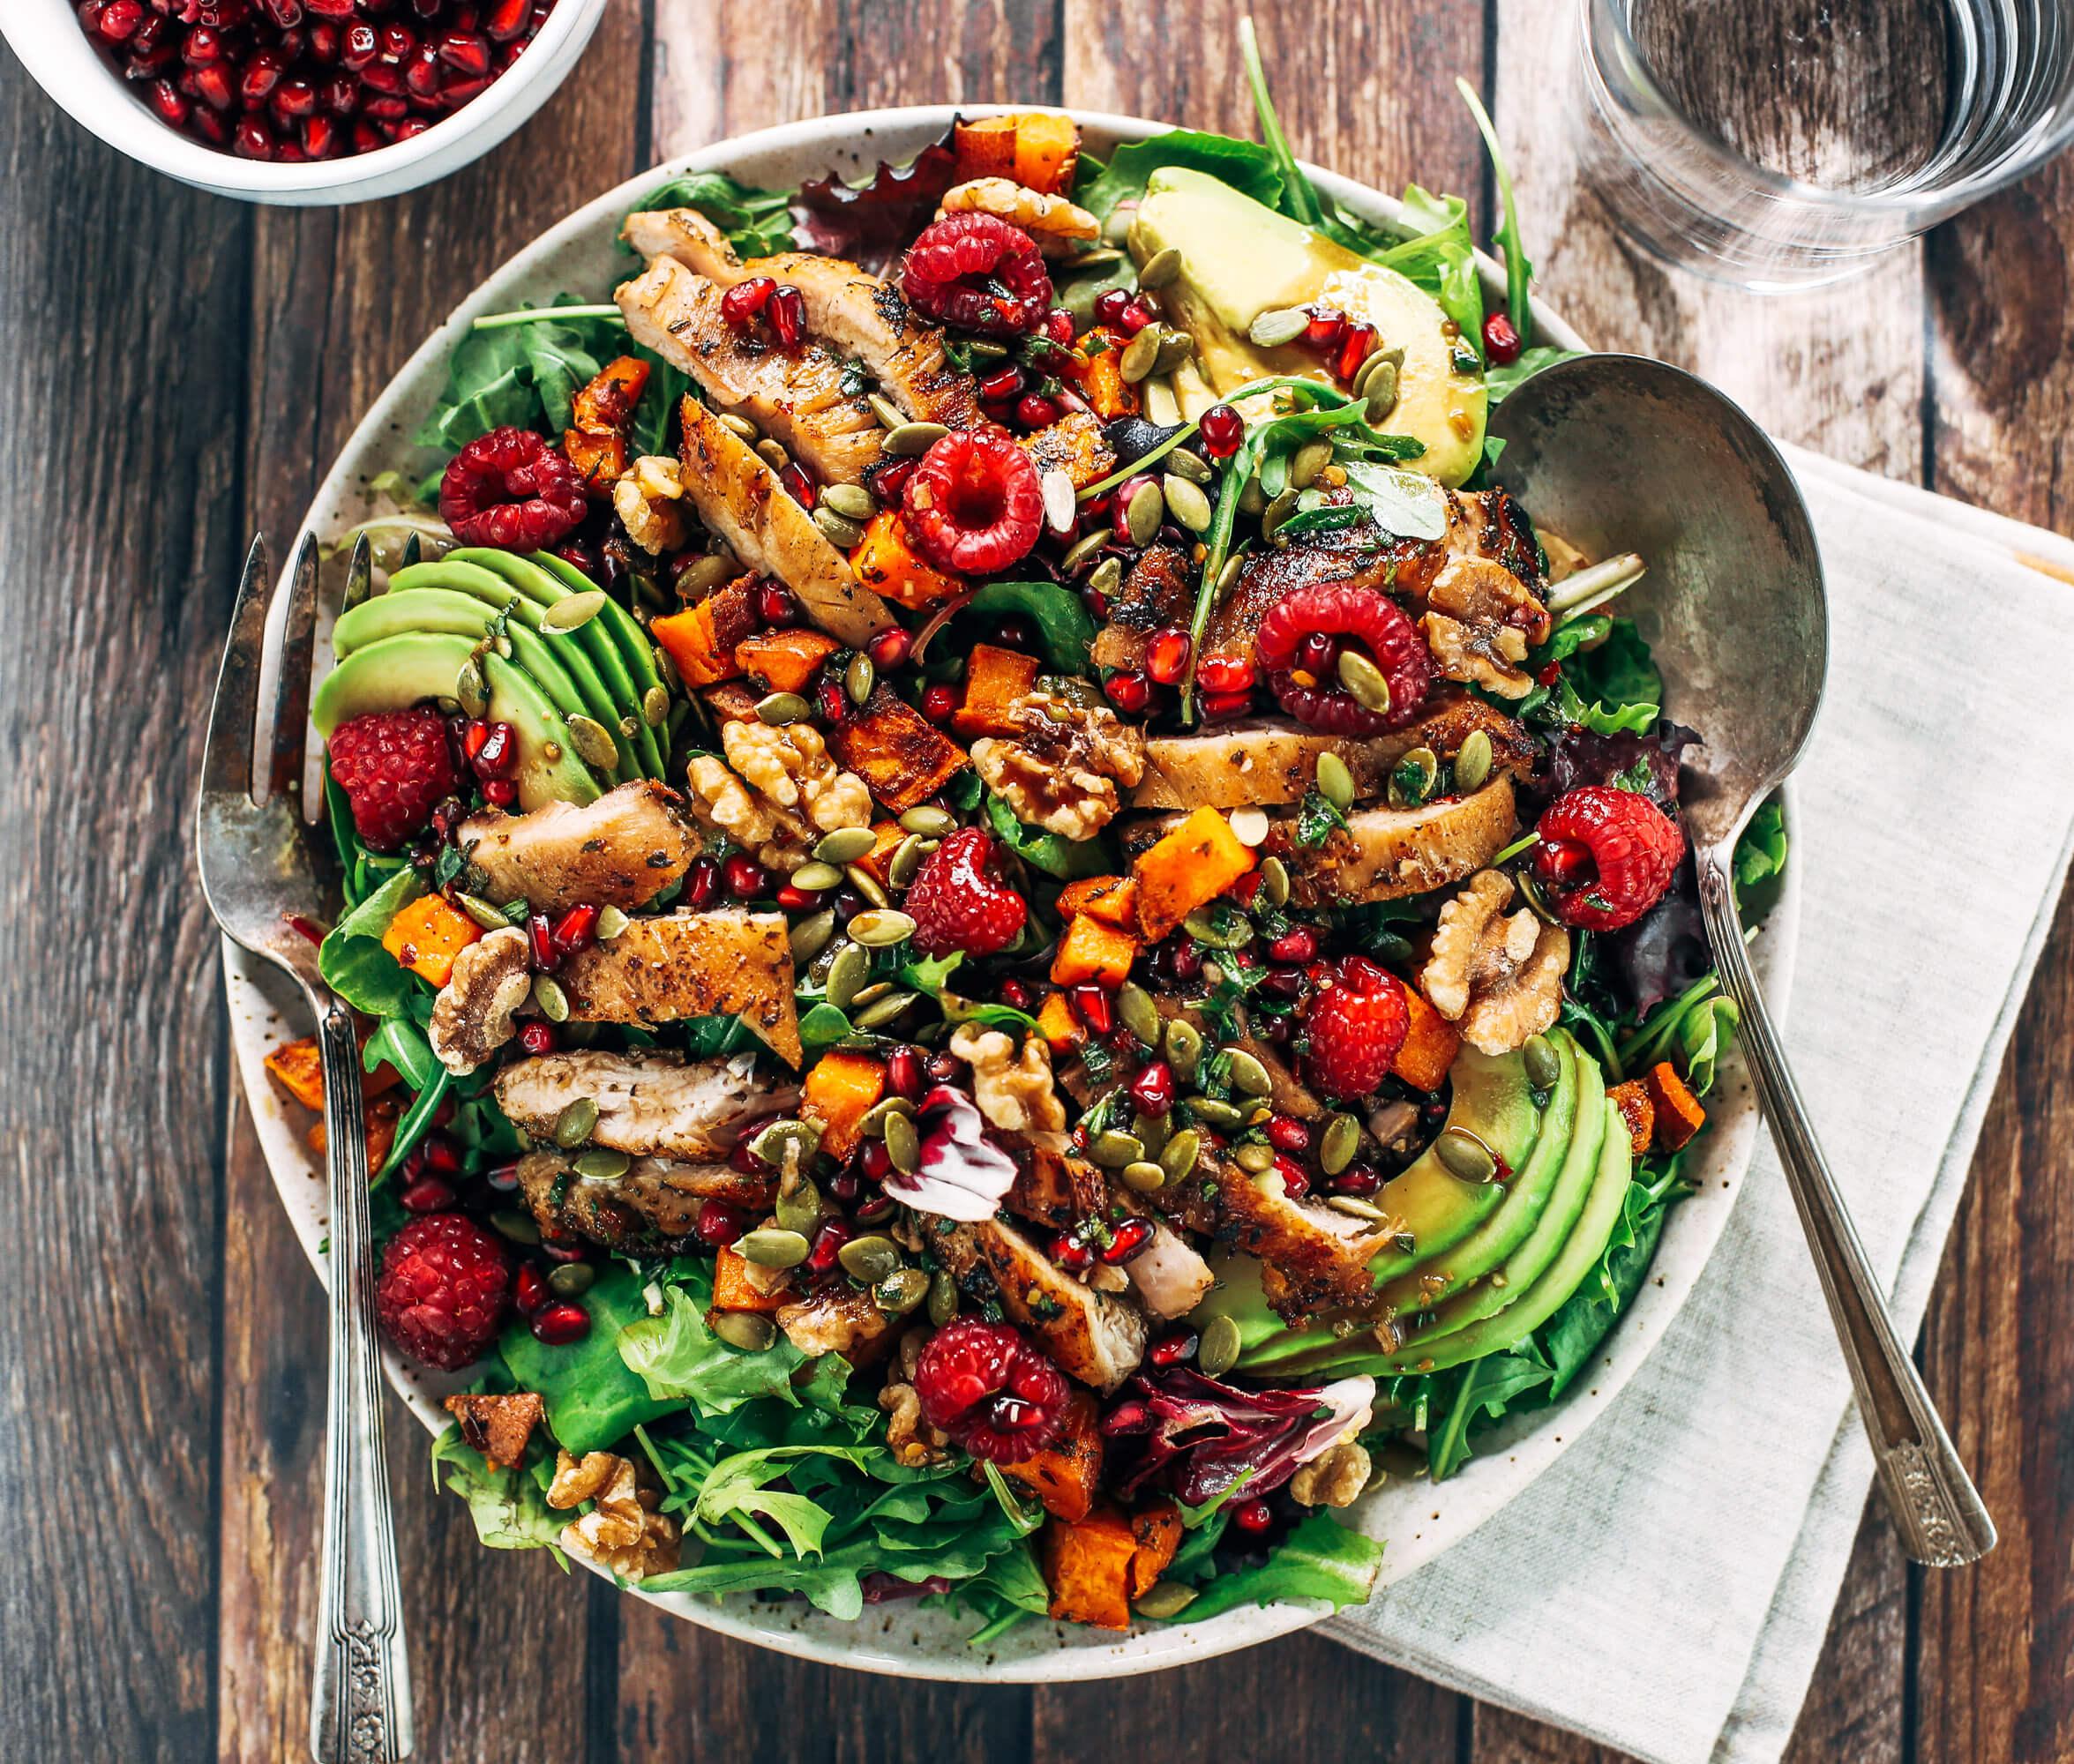 Whole30 Harvest Chicken Salad Paleo Gluten Free Eats